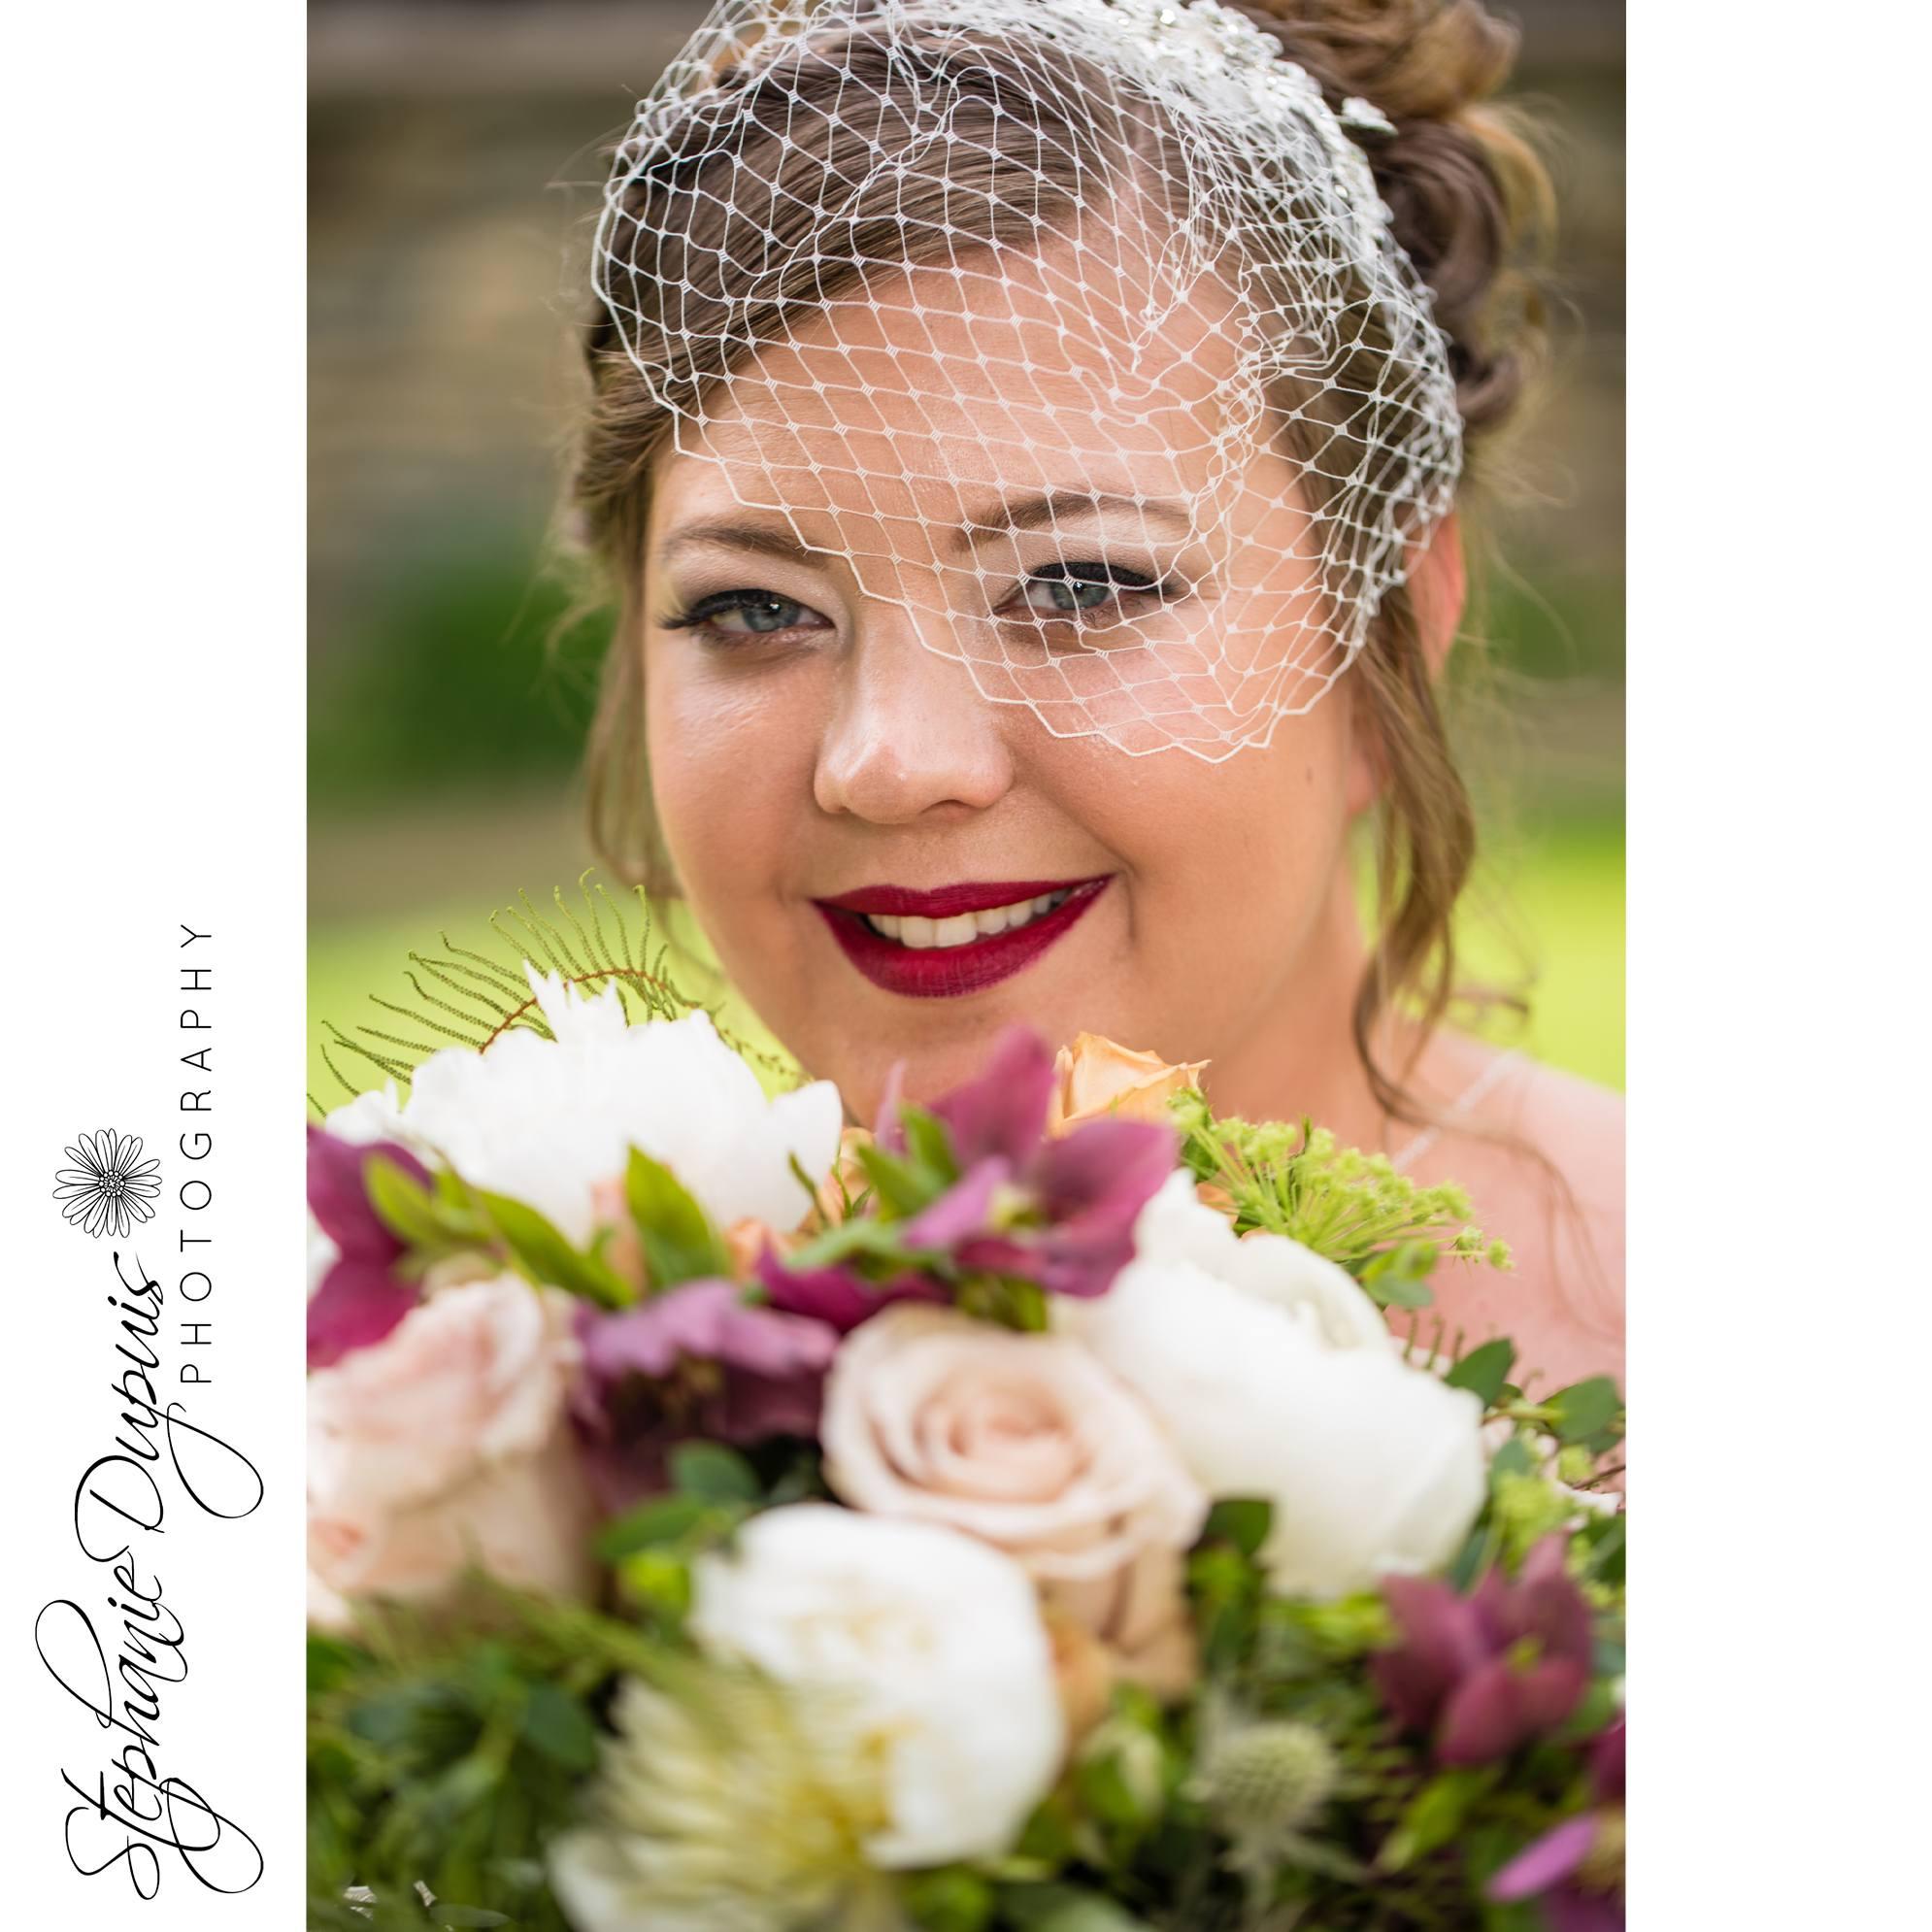 Pushee 7 - Portfolio: Pushee Wedding